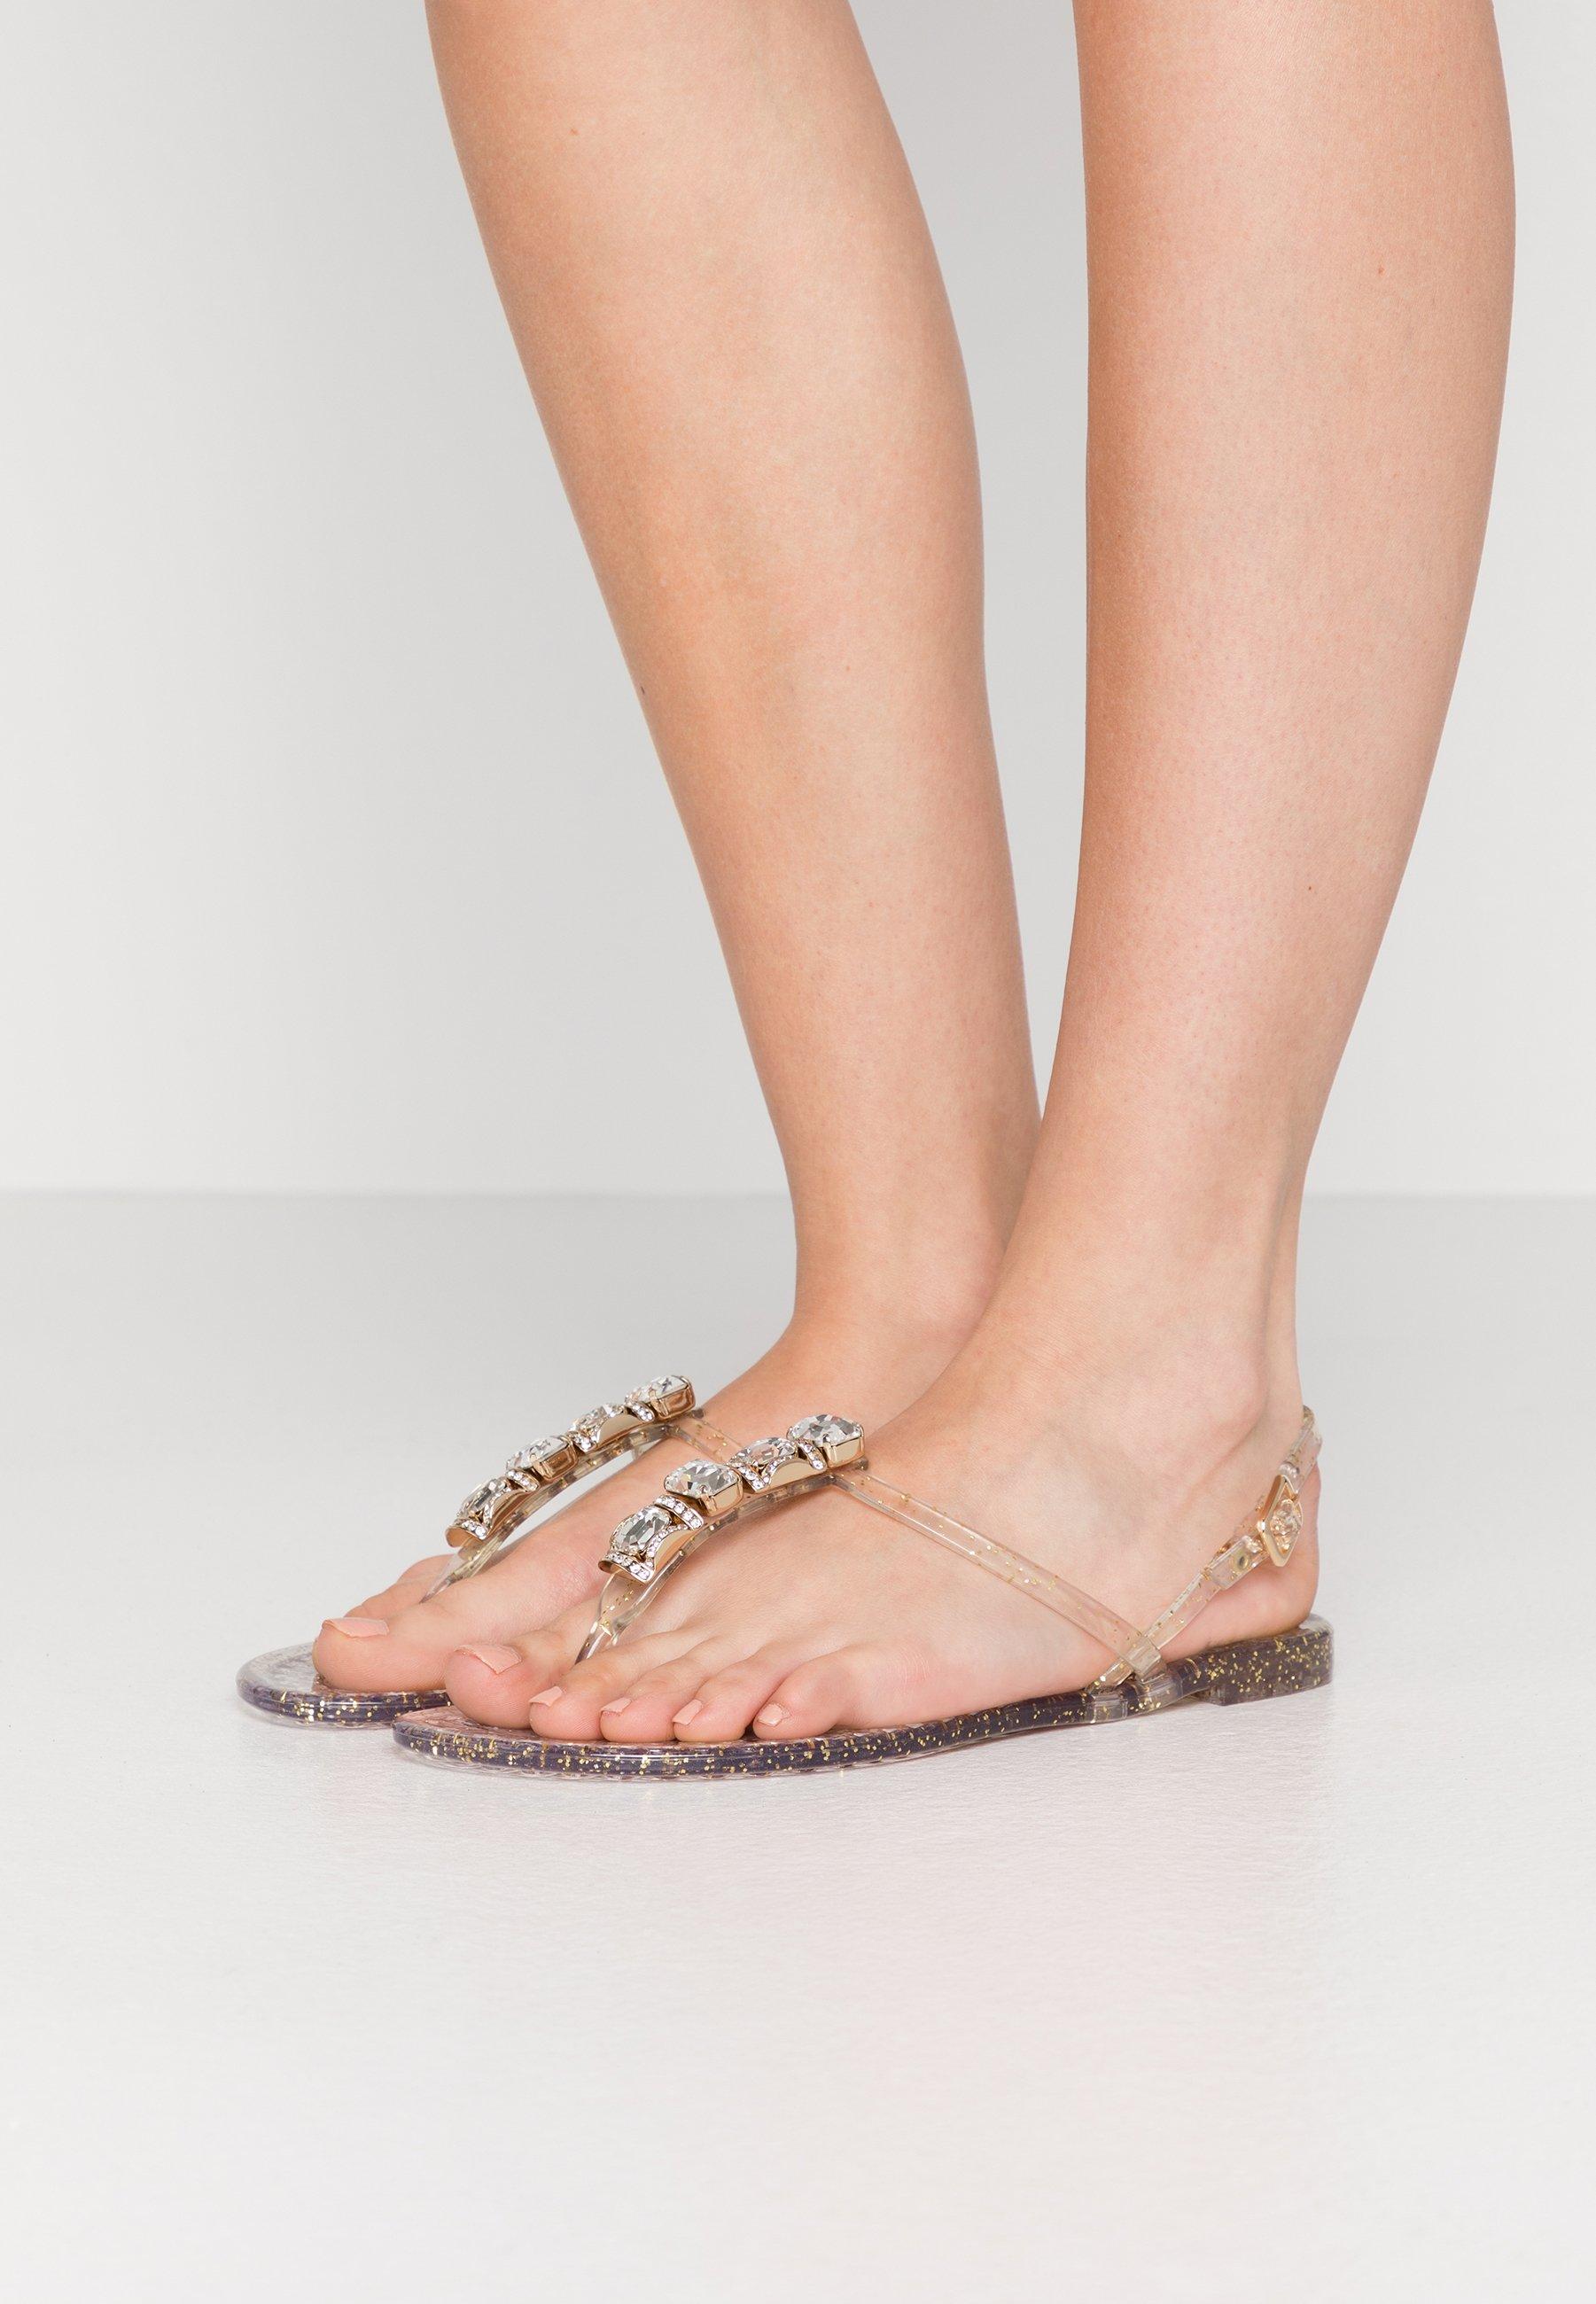 Casadei Flip Flops - minorca nero